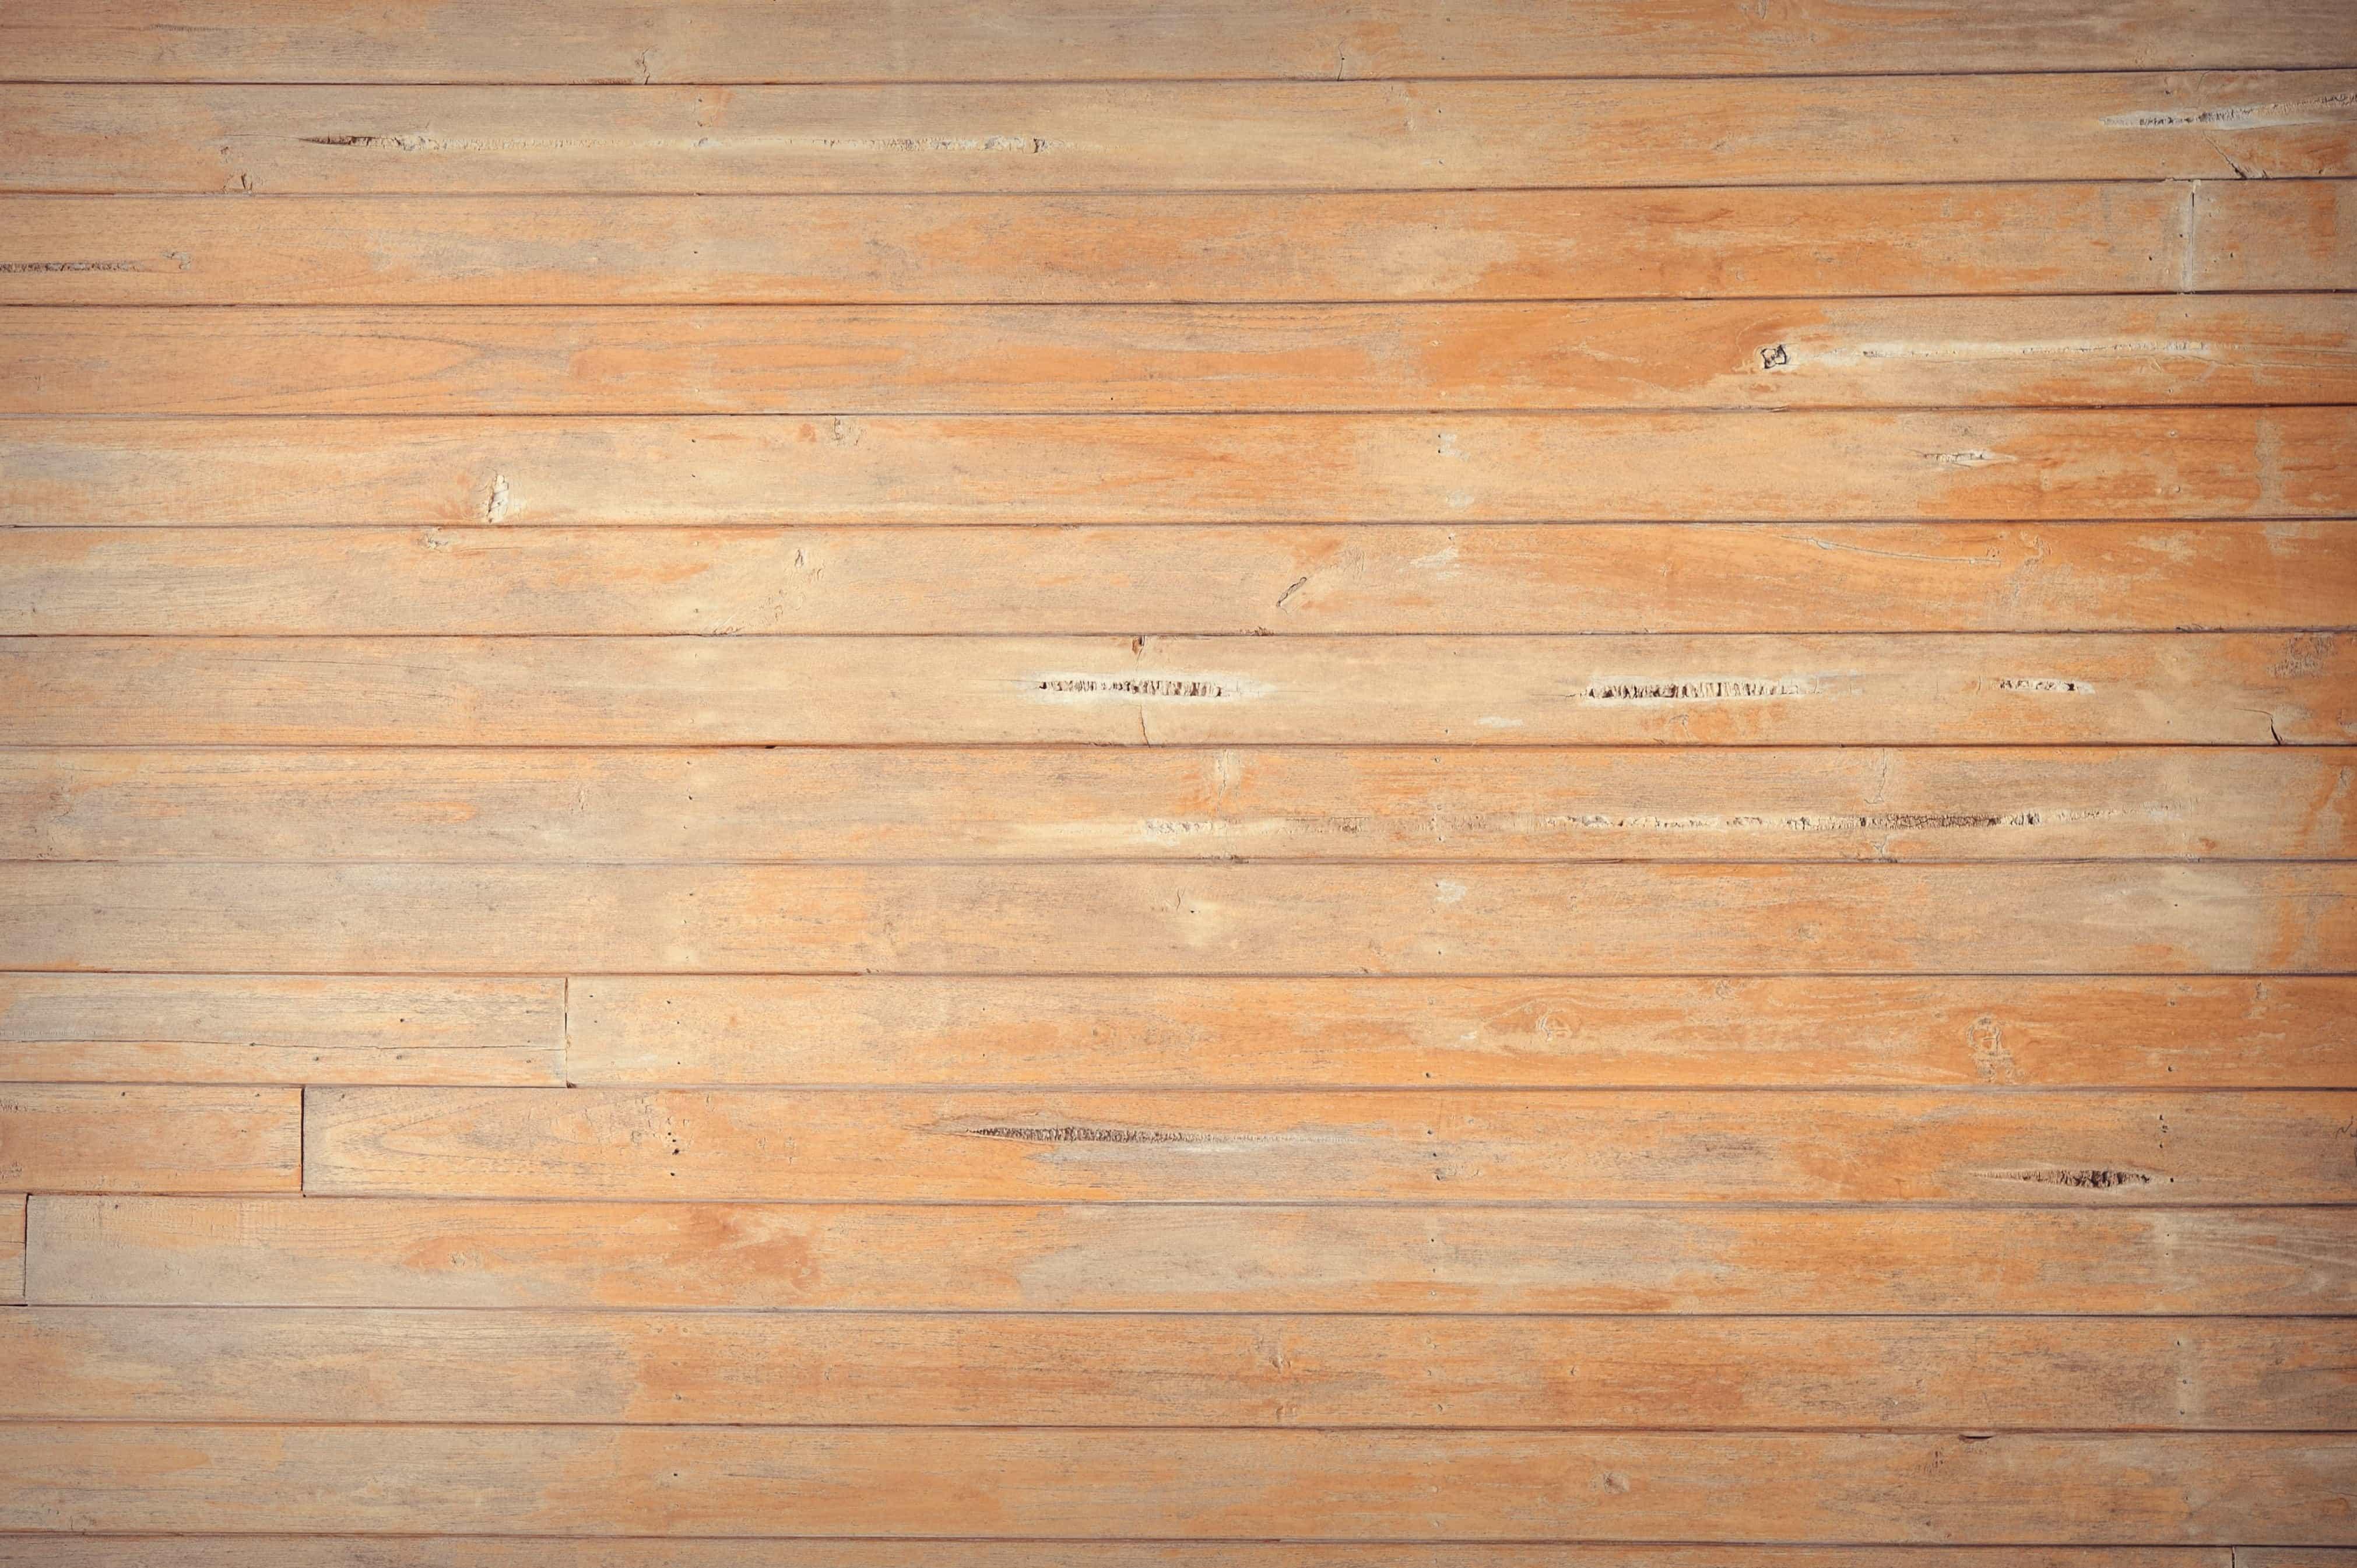 Kostenlose Bild Zimmerei Holz Boden Rau Retro Hartholz Oberflache